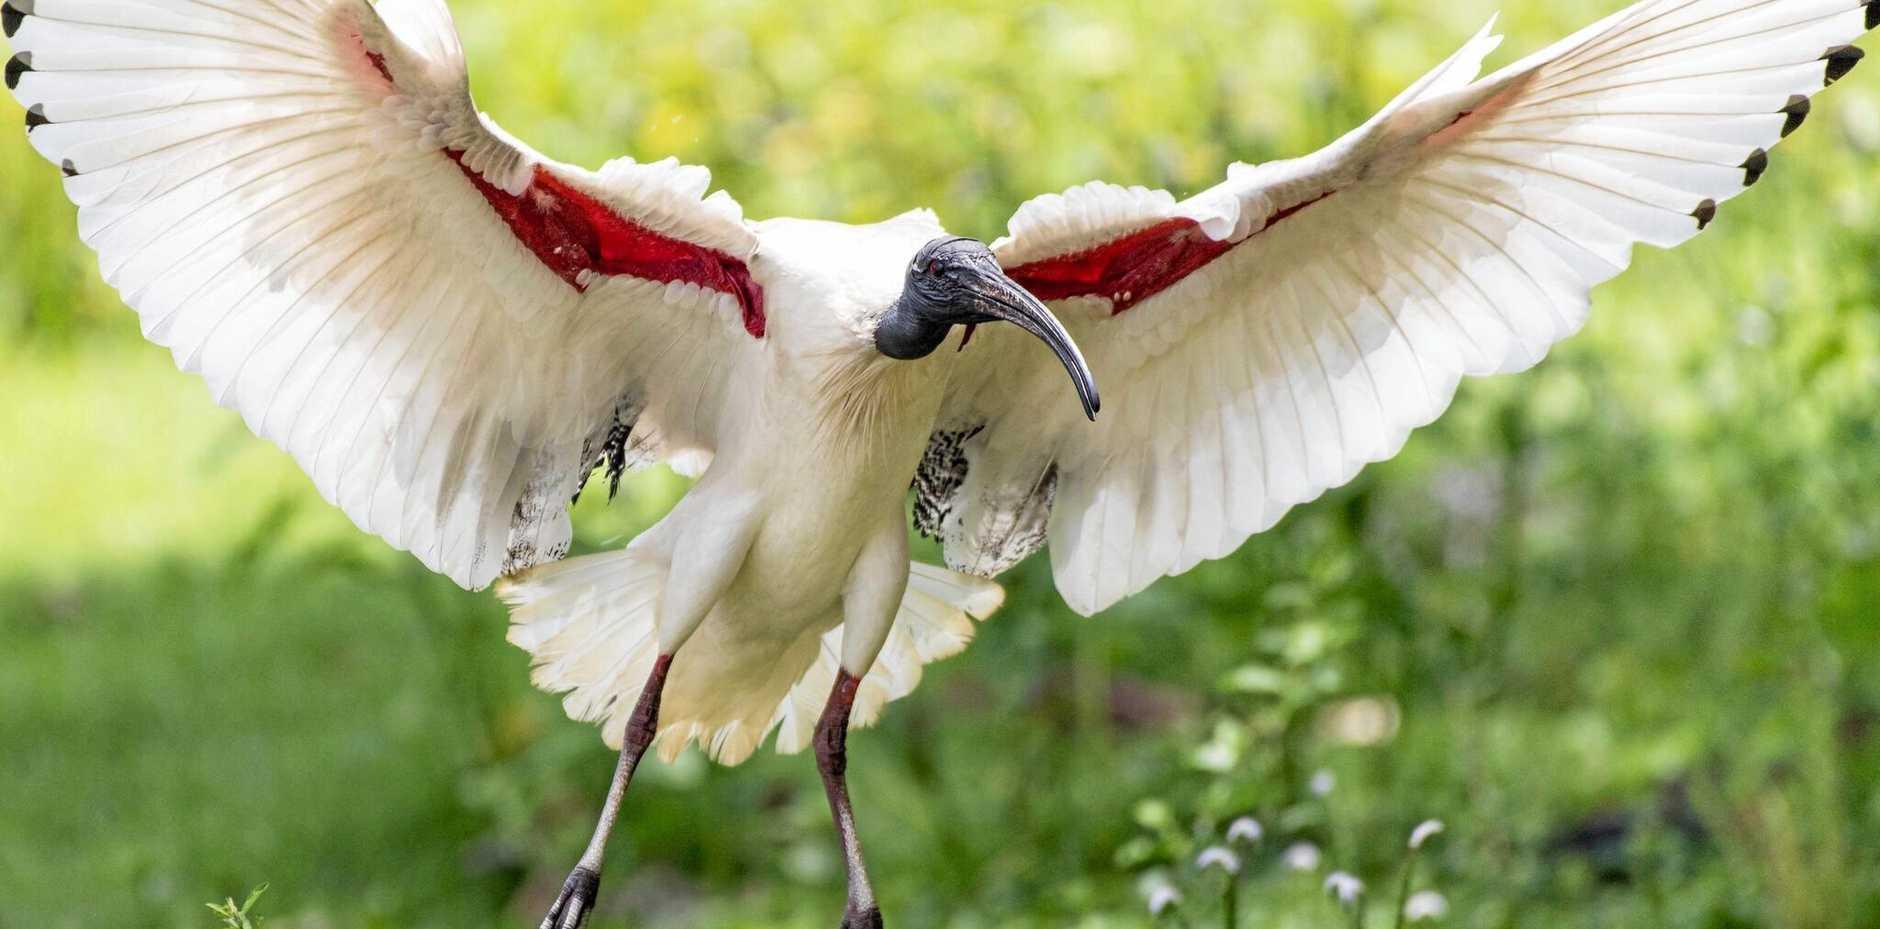 An ibis, also referred to colloquially as a 'bin chicken'.